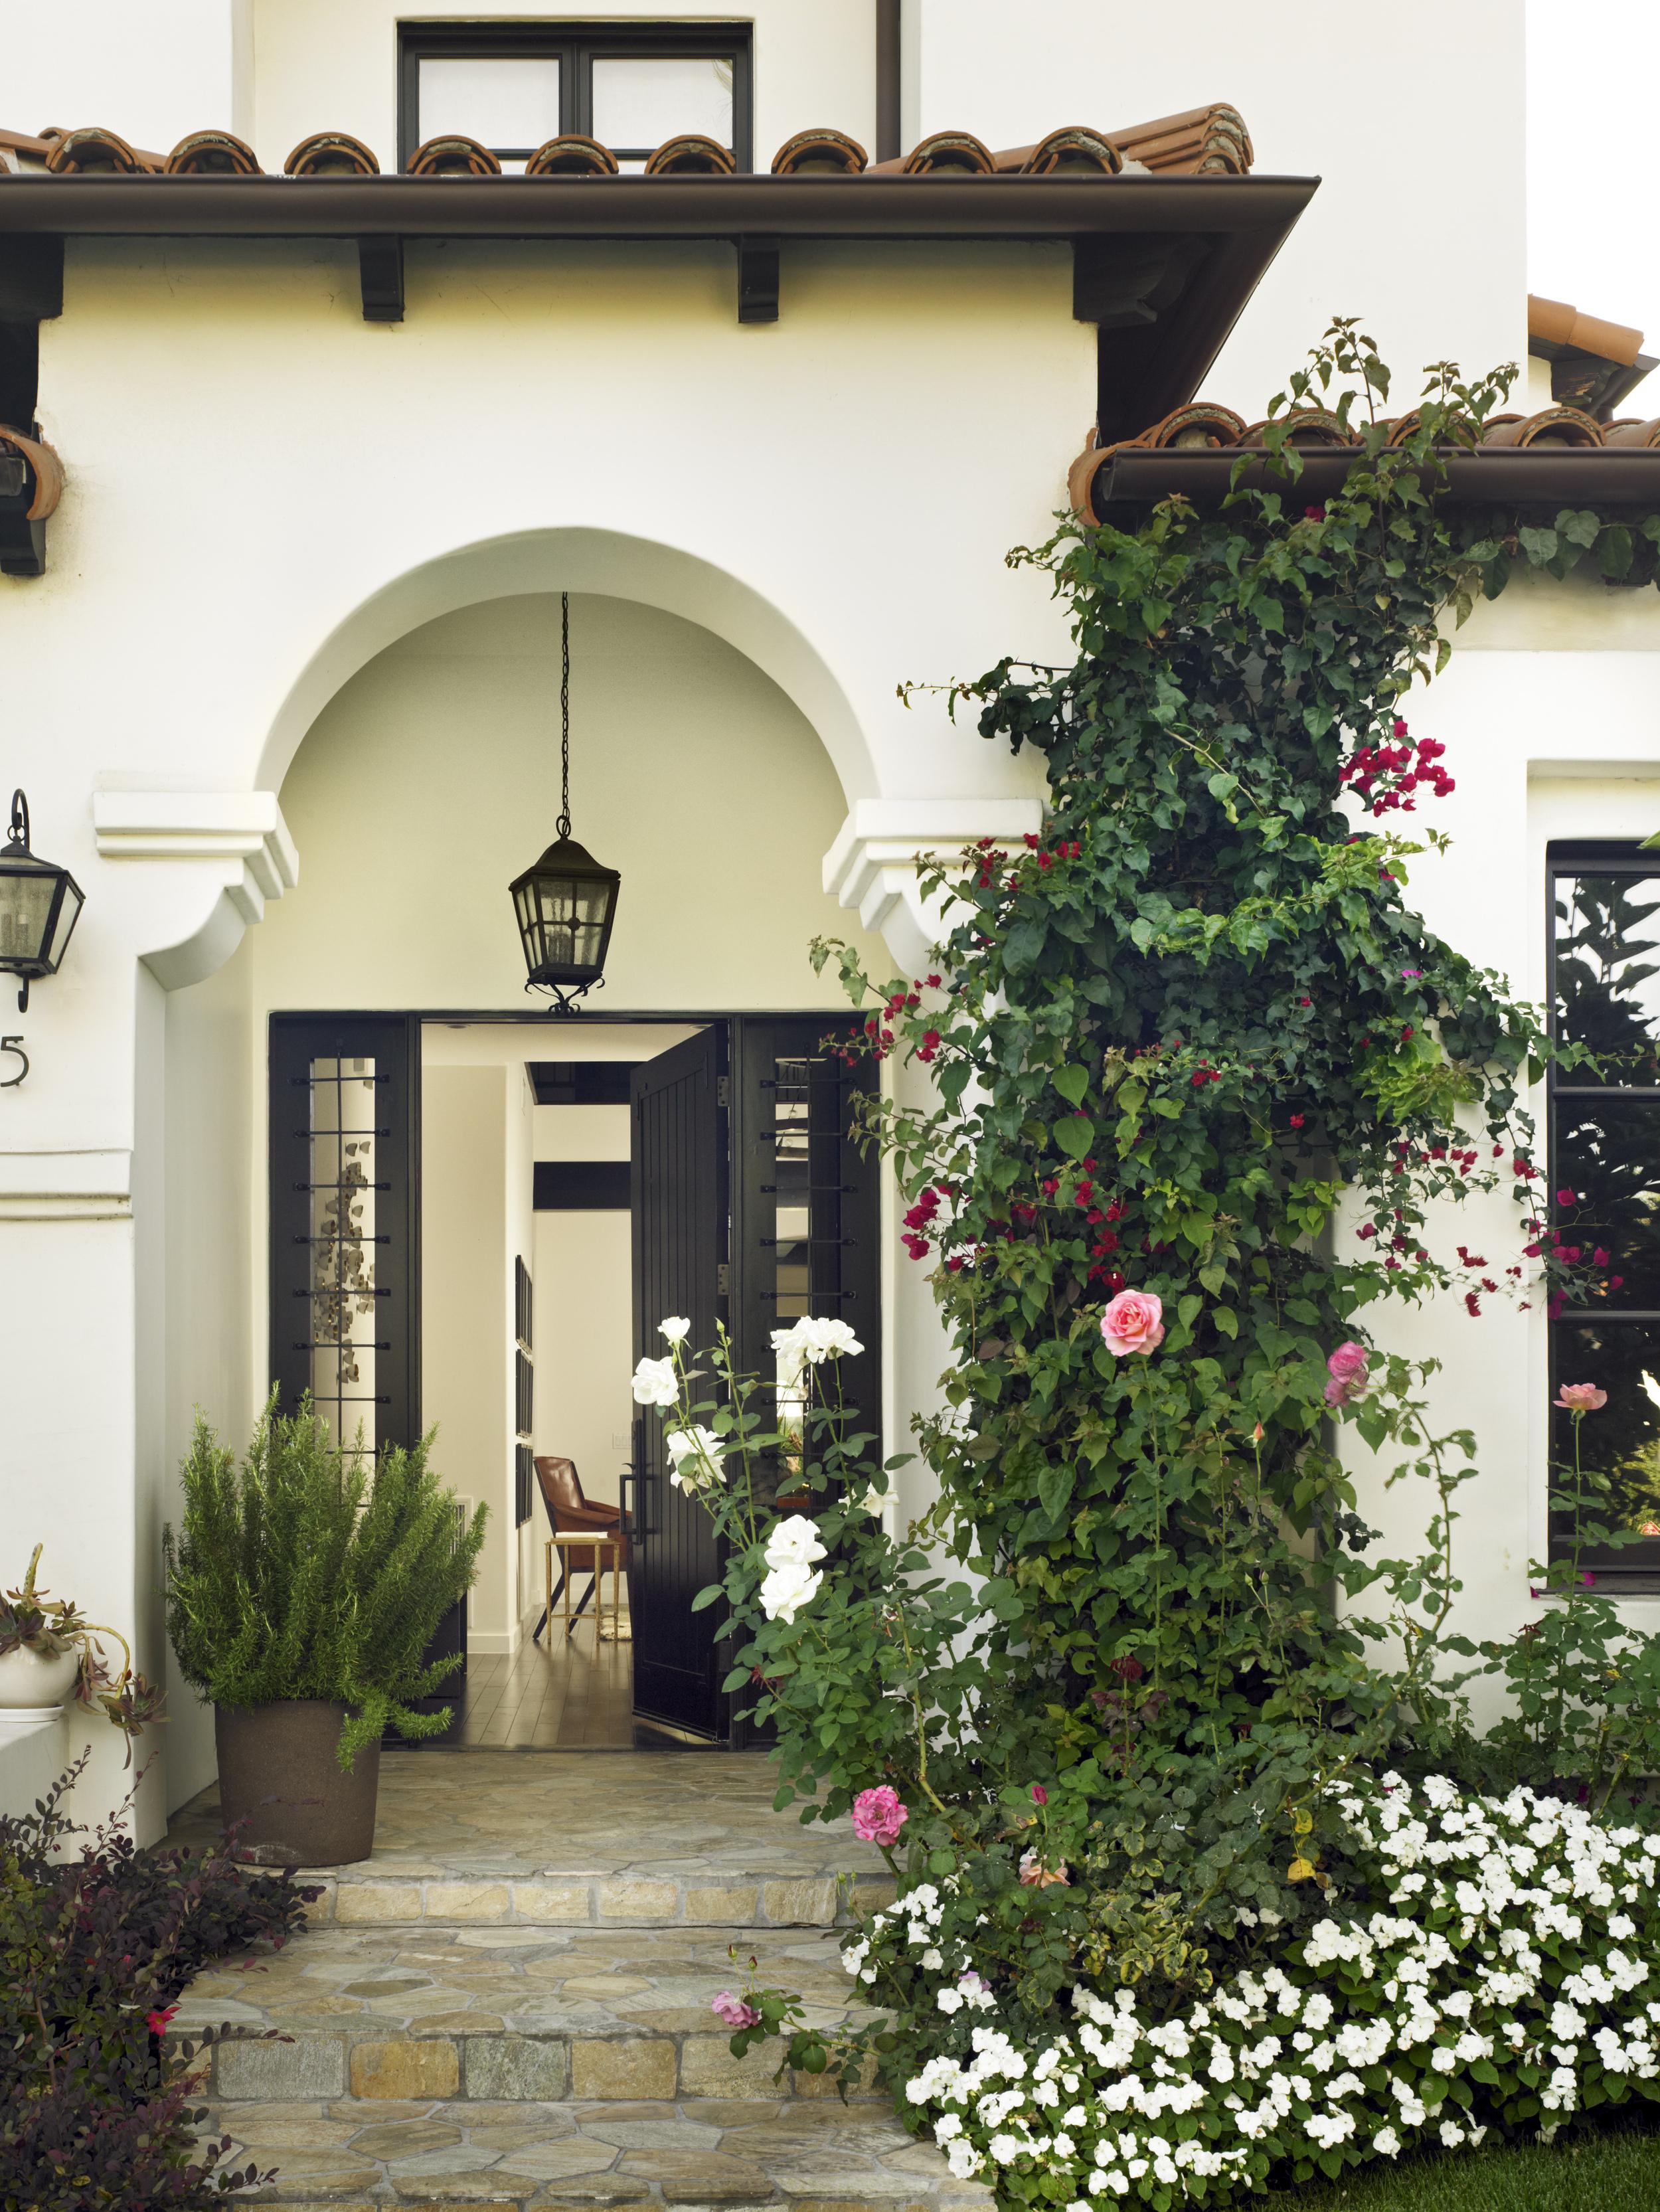 Kadlec Architecture + Design - West Hollywood Bungalow 1.jpg